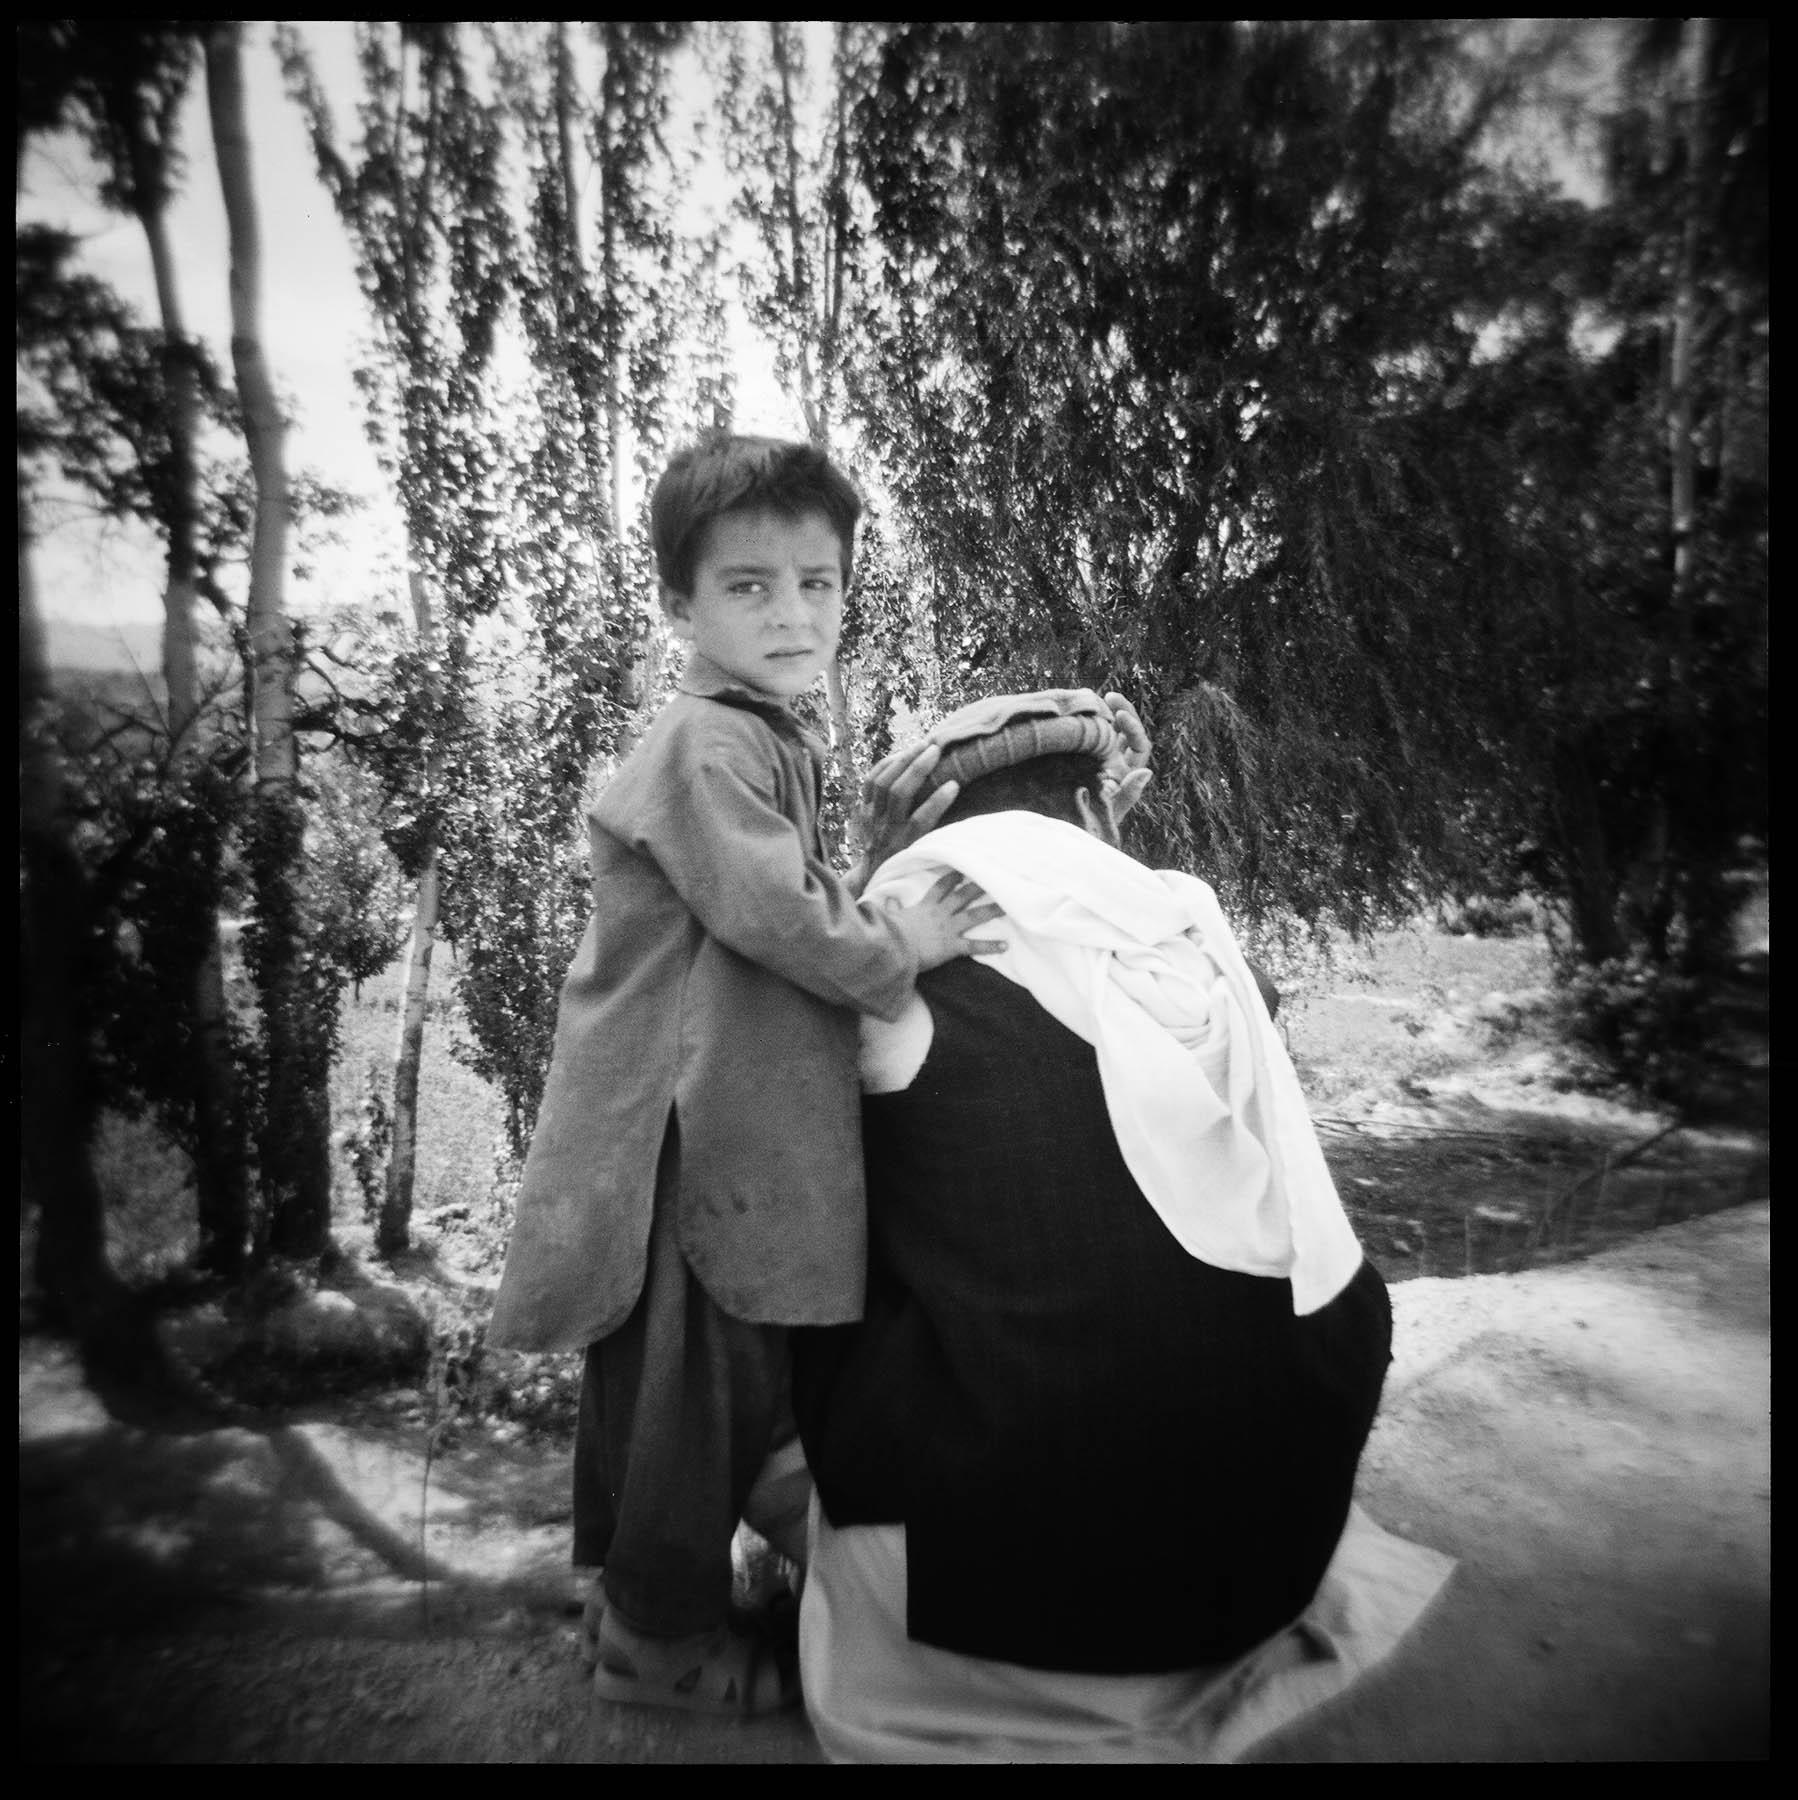 Orgun District, Paktika Province, Afghanistan. 2011.